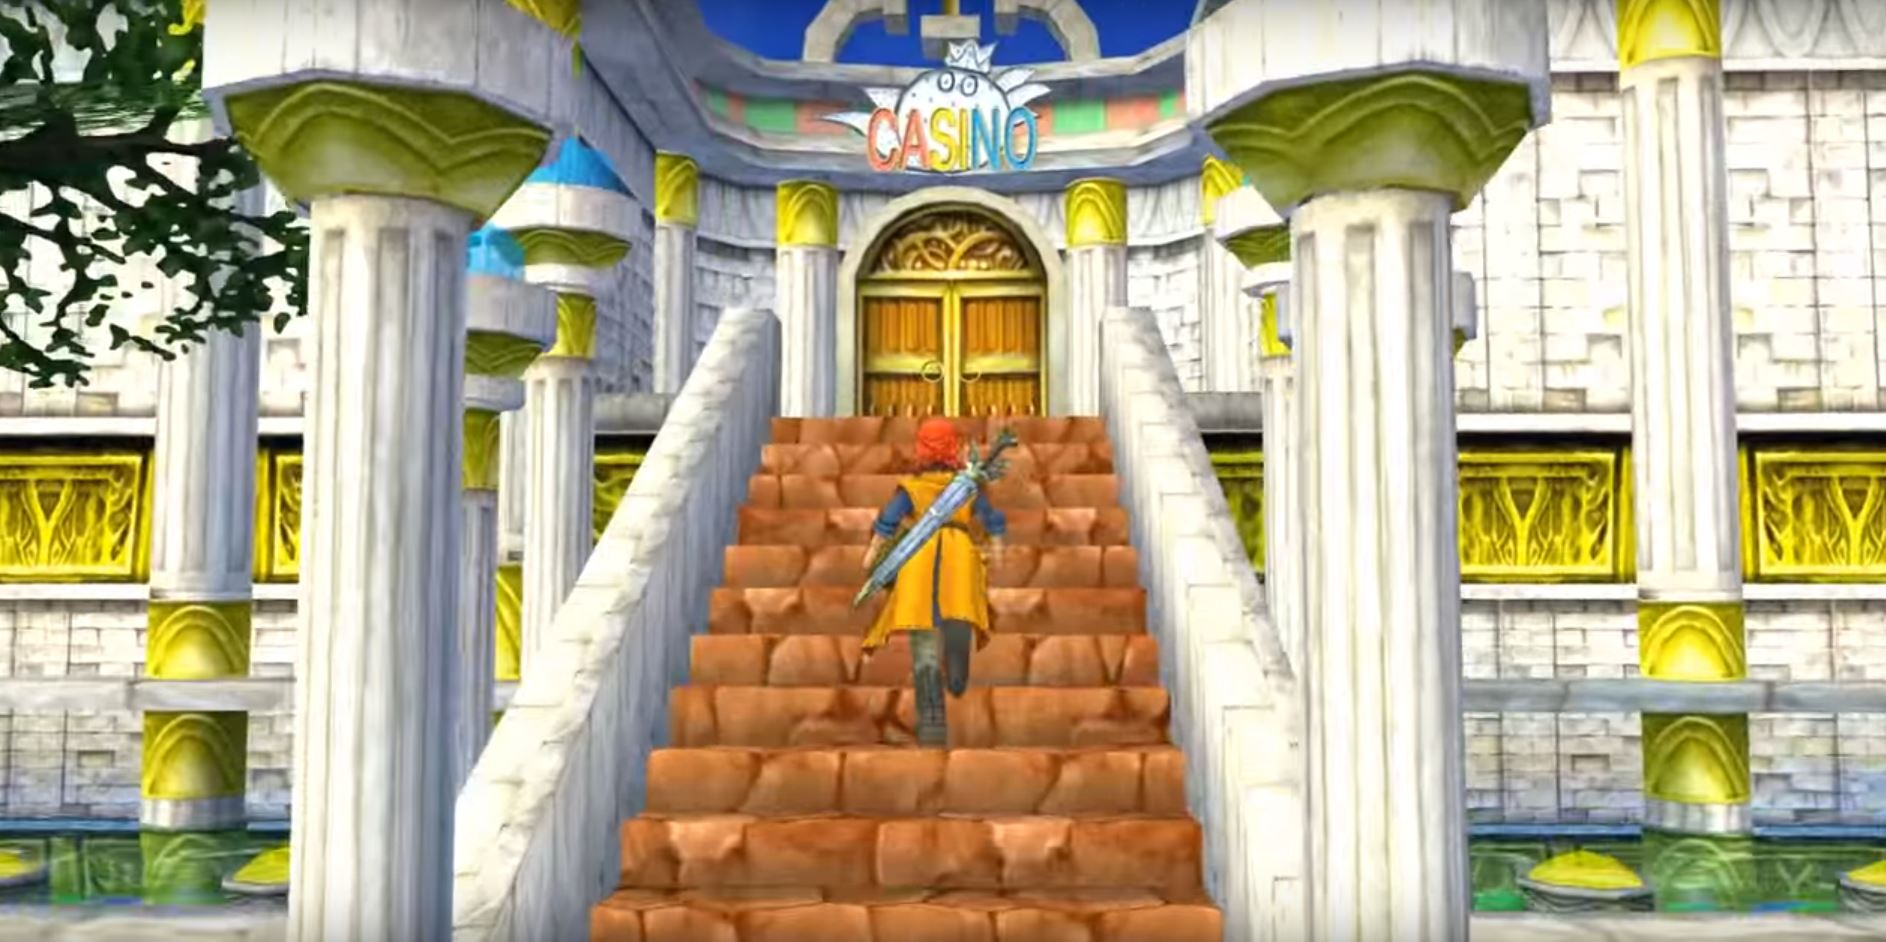 baccarat casino dragon quest 8